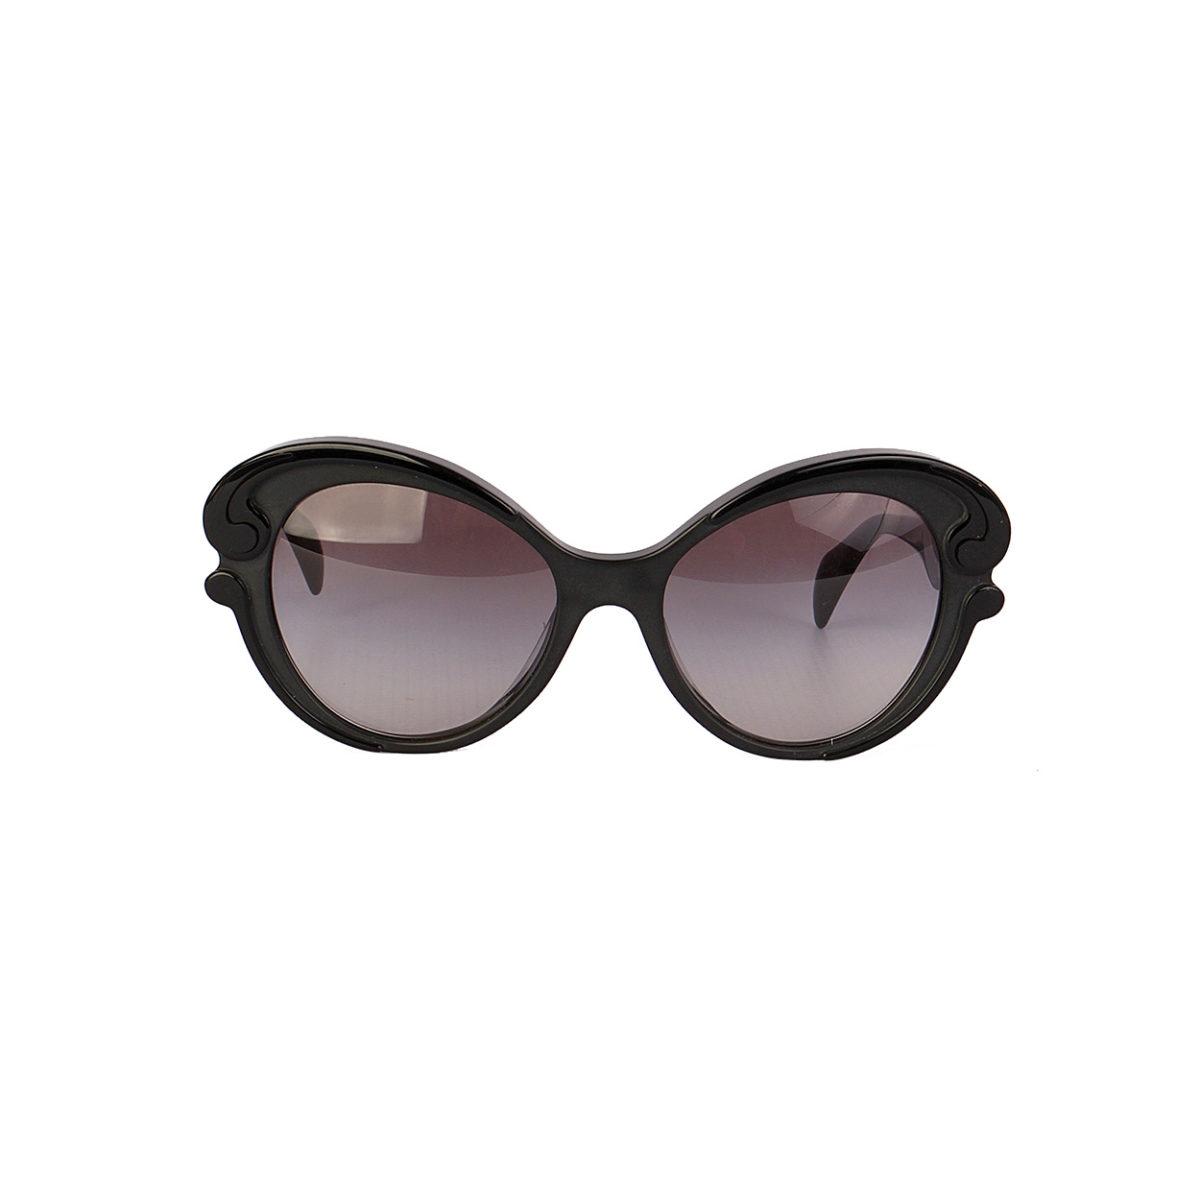 9fb6c53ca9 denmark prada havana cat eye sunglasses 0286a f6f10